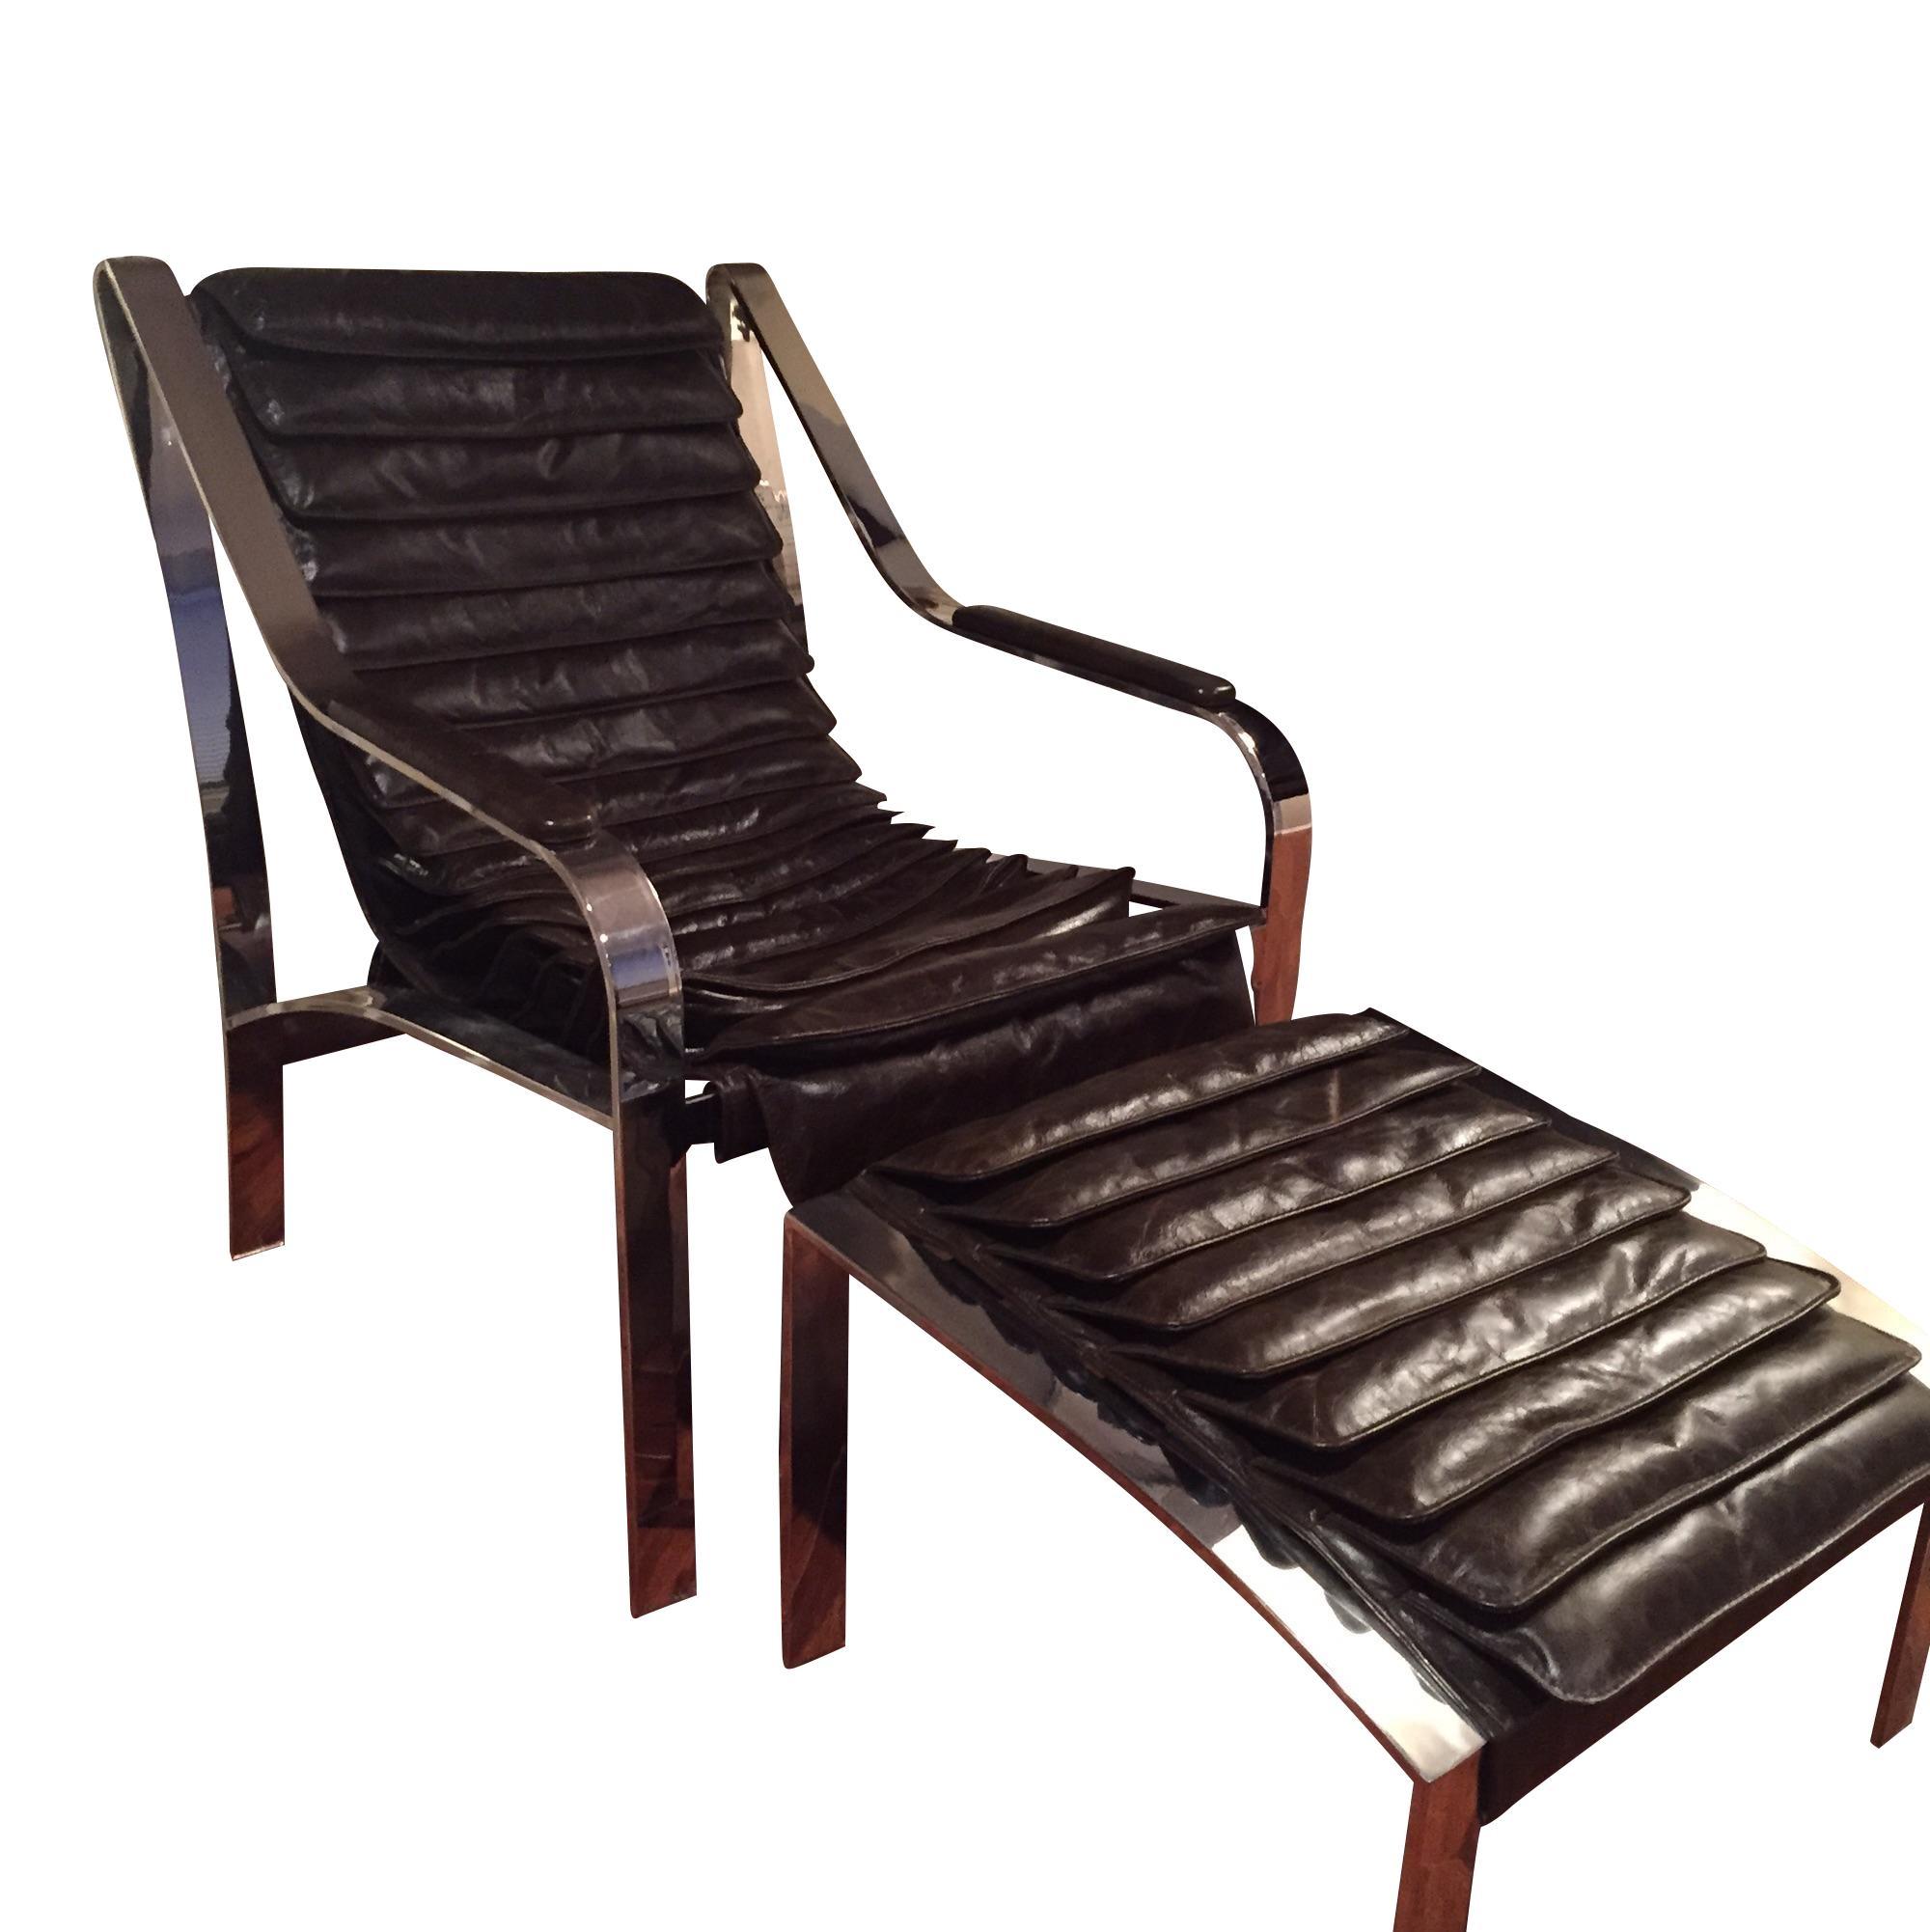 Arhaus Leather Sofa With Ideas Photo 24990 | Kengire With Arhaus Leather Sofas (Image 15 of 20)